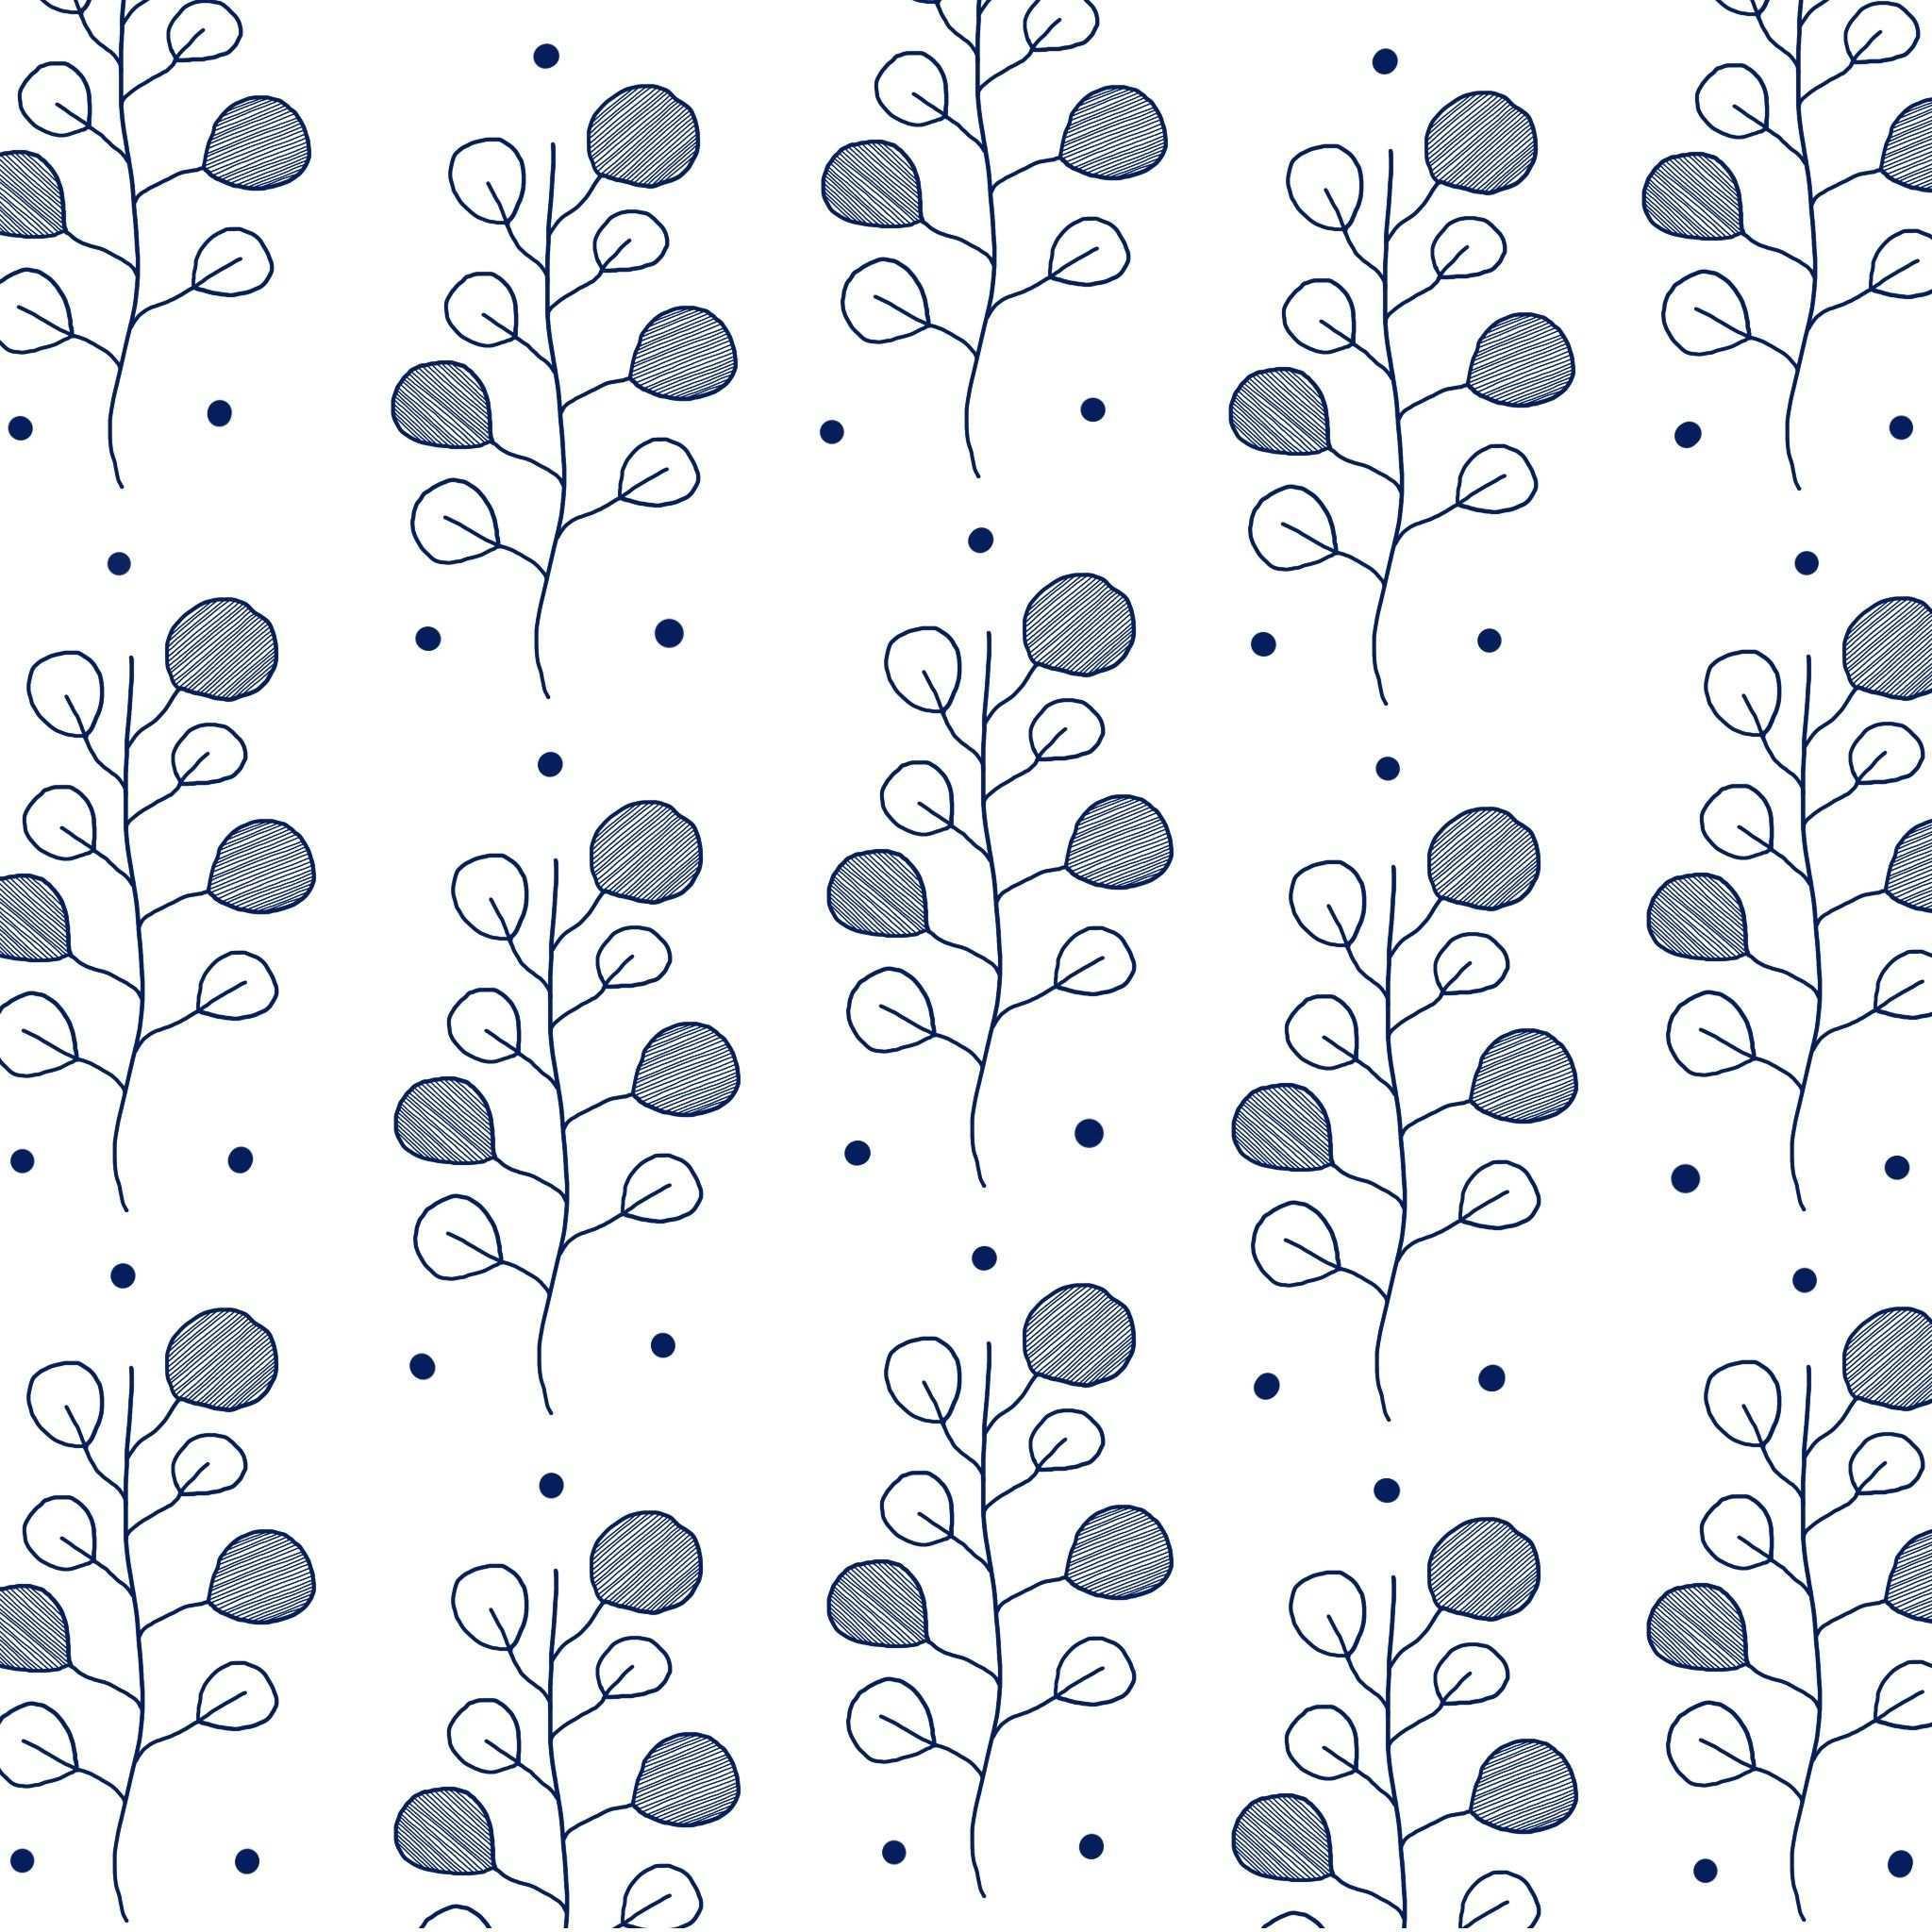 Eucalyptus Pattern In 2020 Printed Shower Curtain Pattern Prints